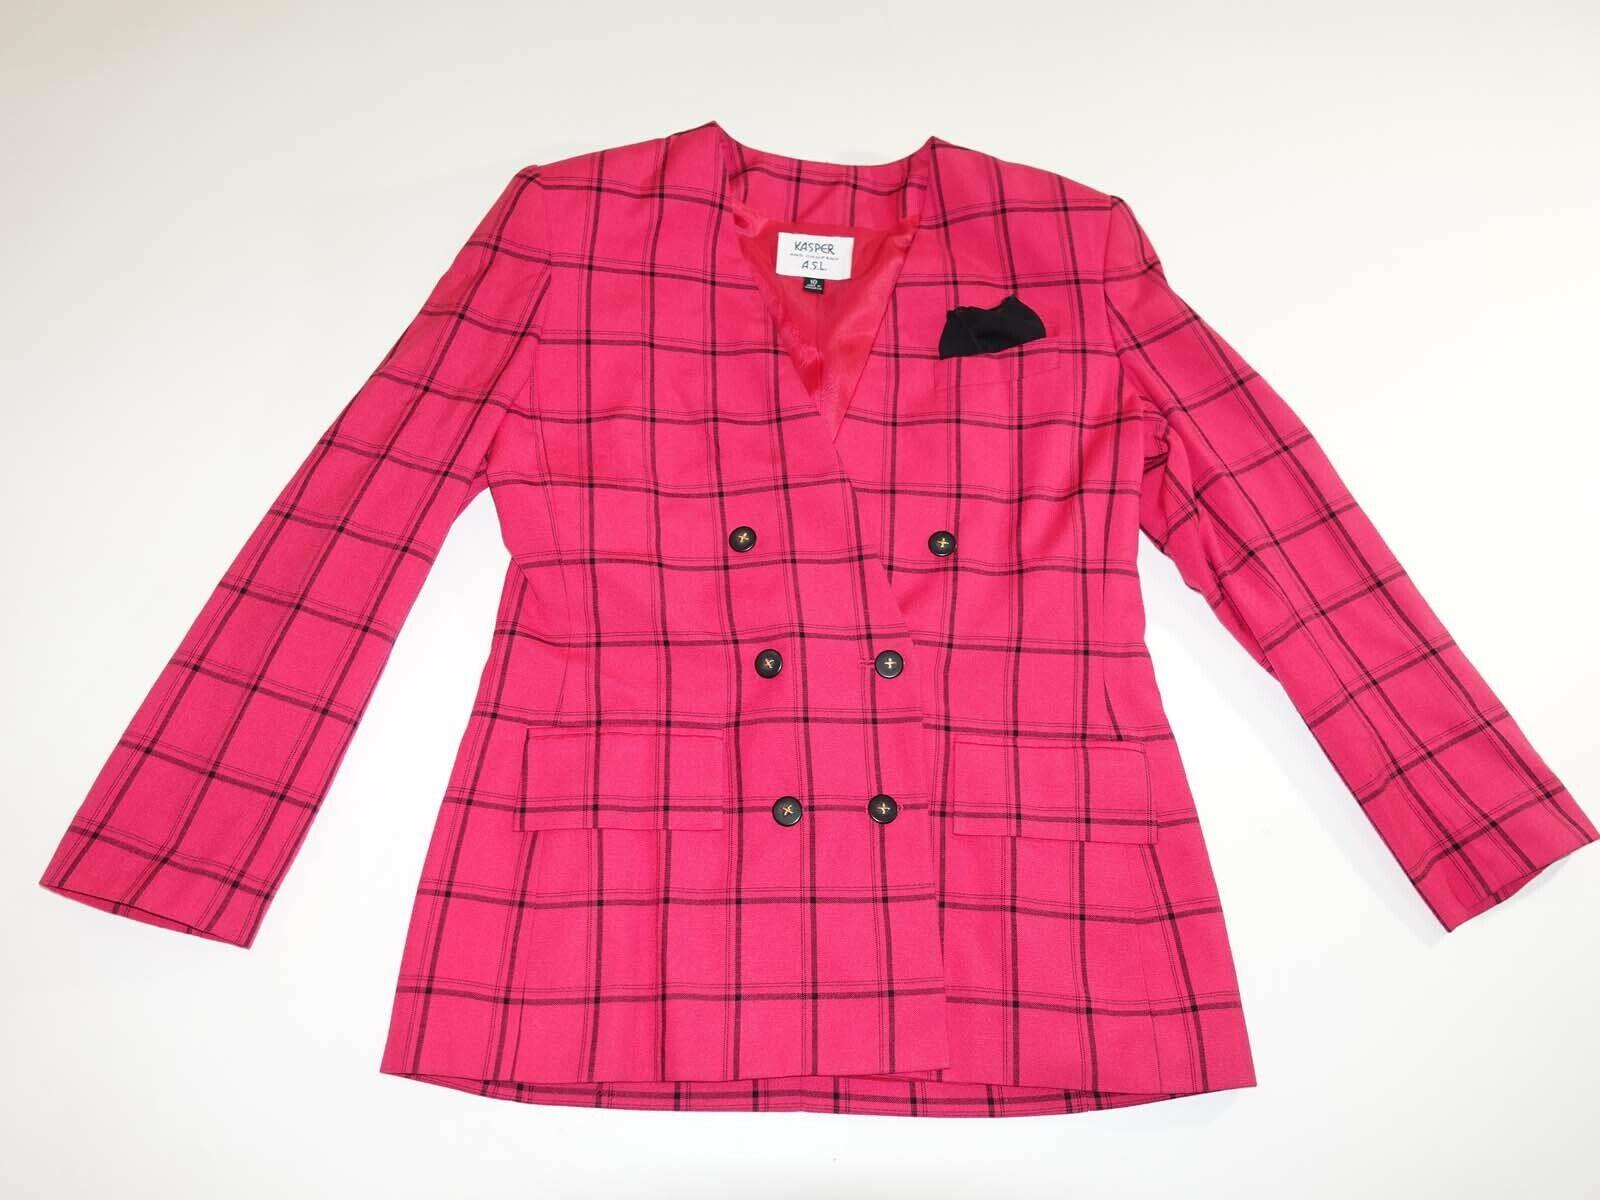 Kasper A. S. L.Damen Zweireihig Jacke Blazer Größe 10 Rosa Kariert Gefüttert